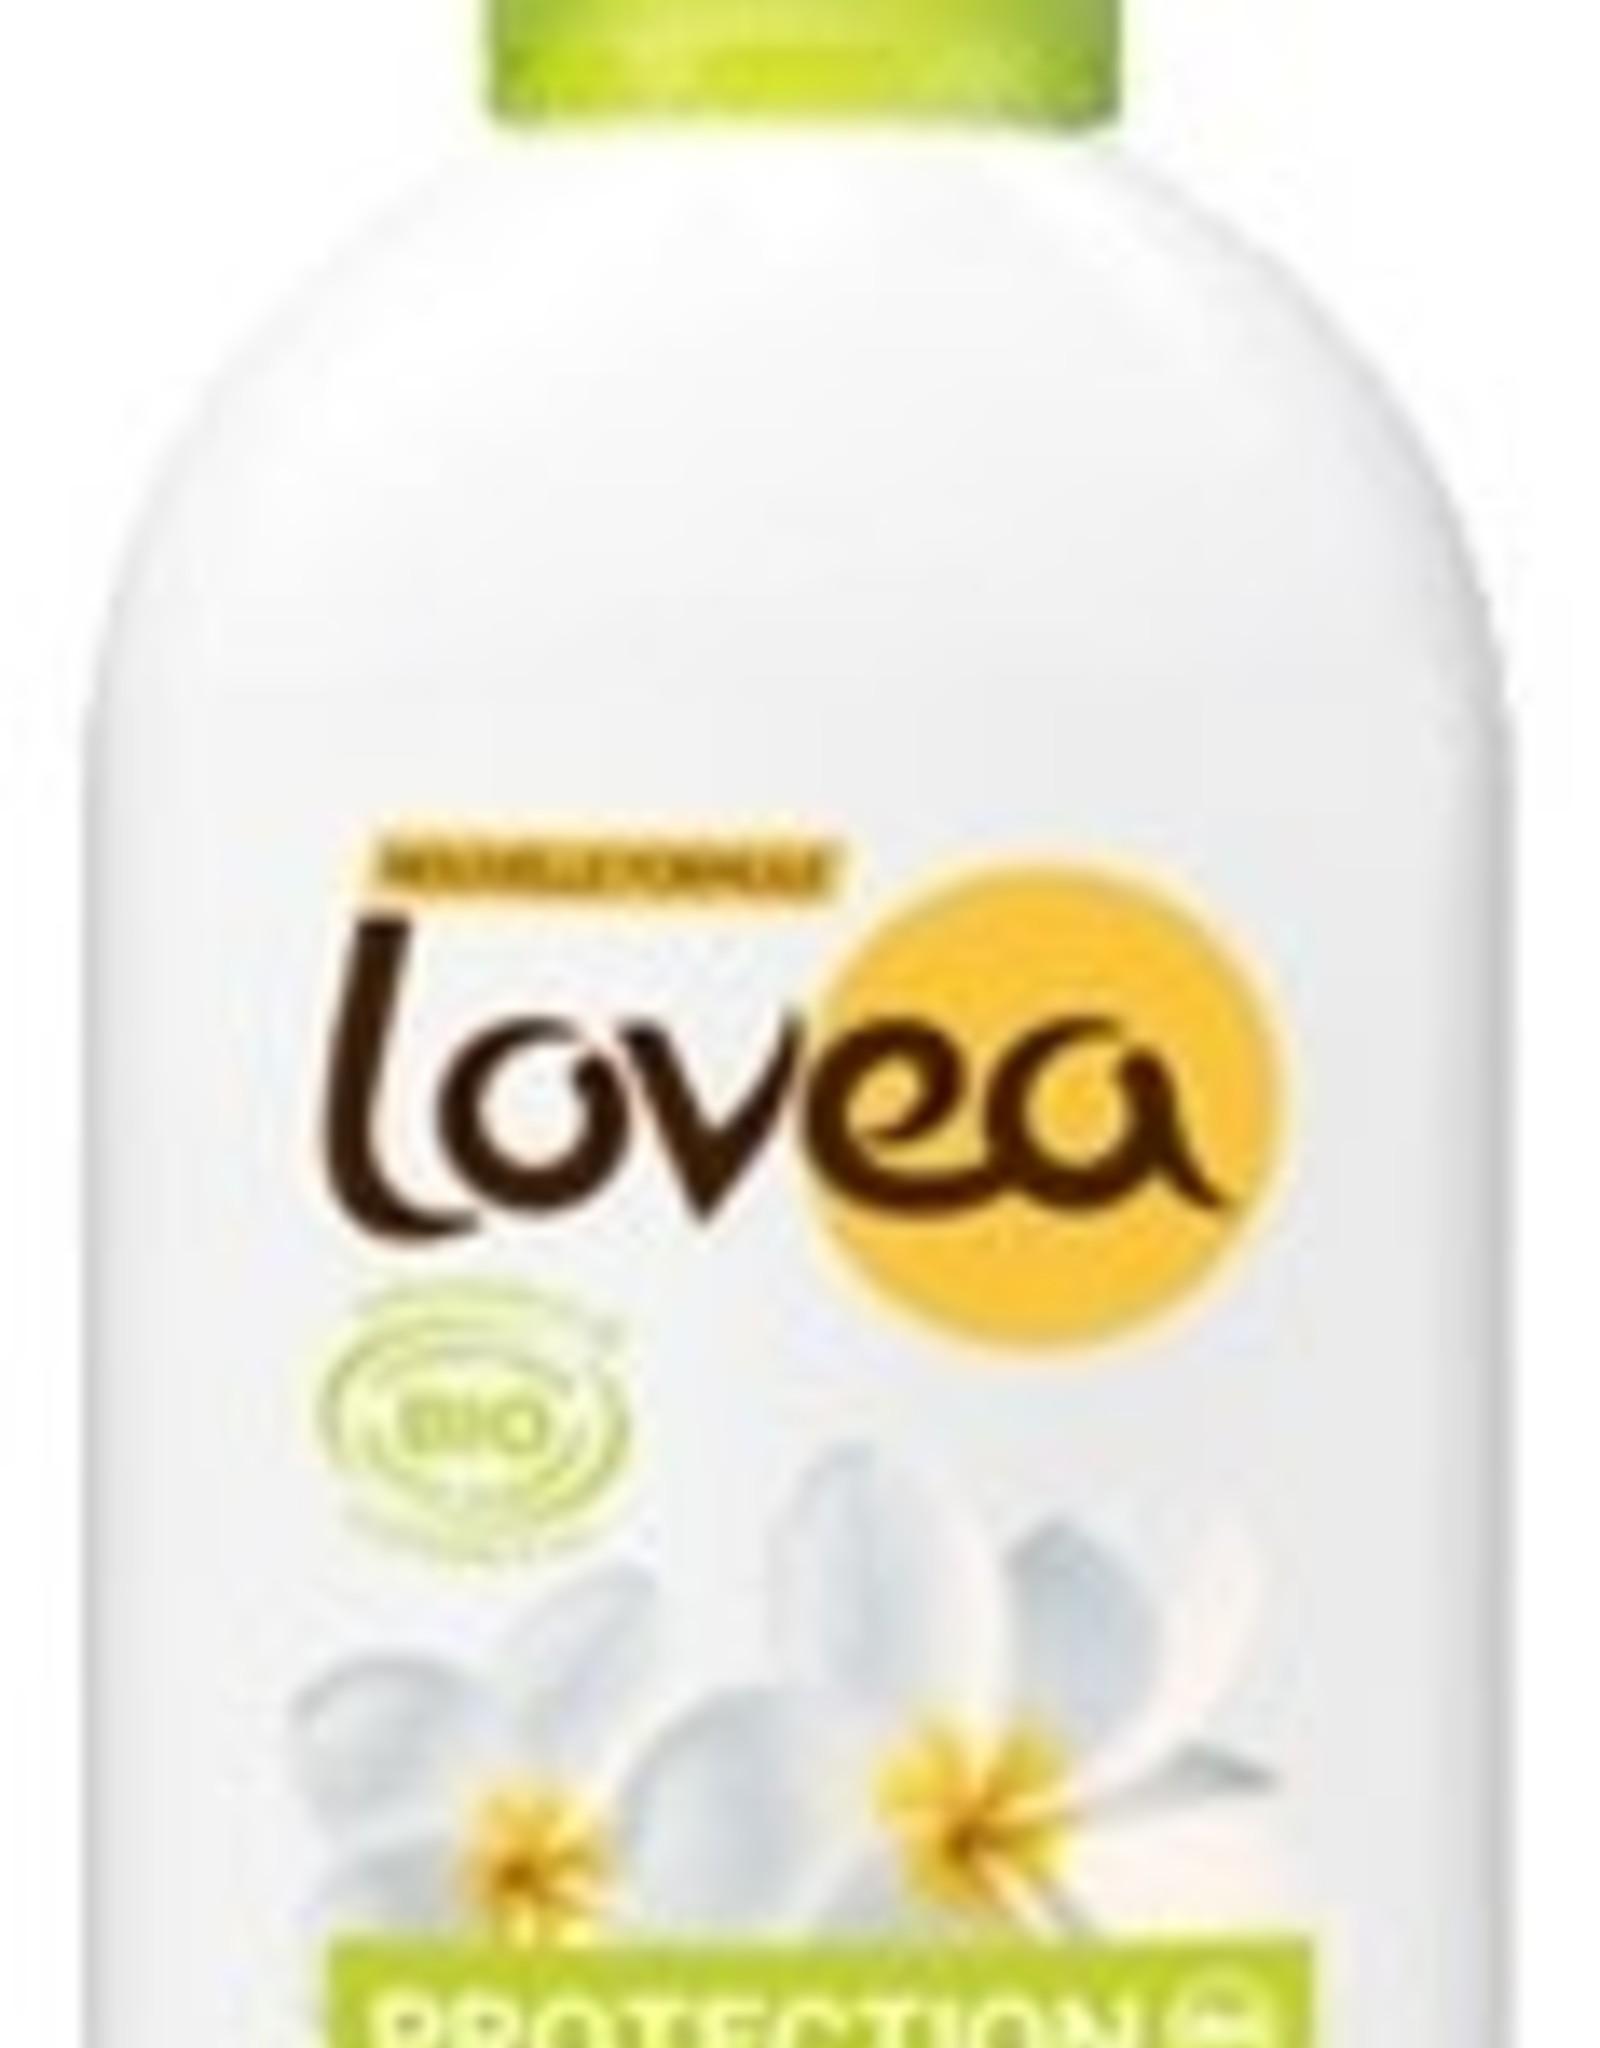 Lovea Bio sun spray SPF30 - 100ml